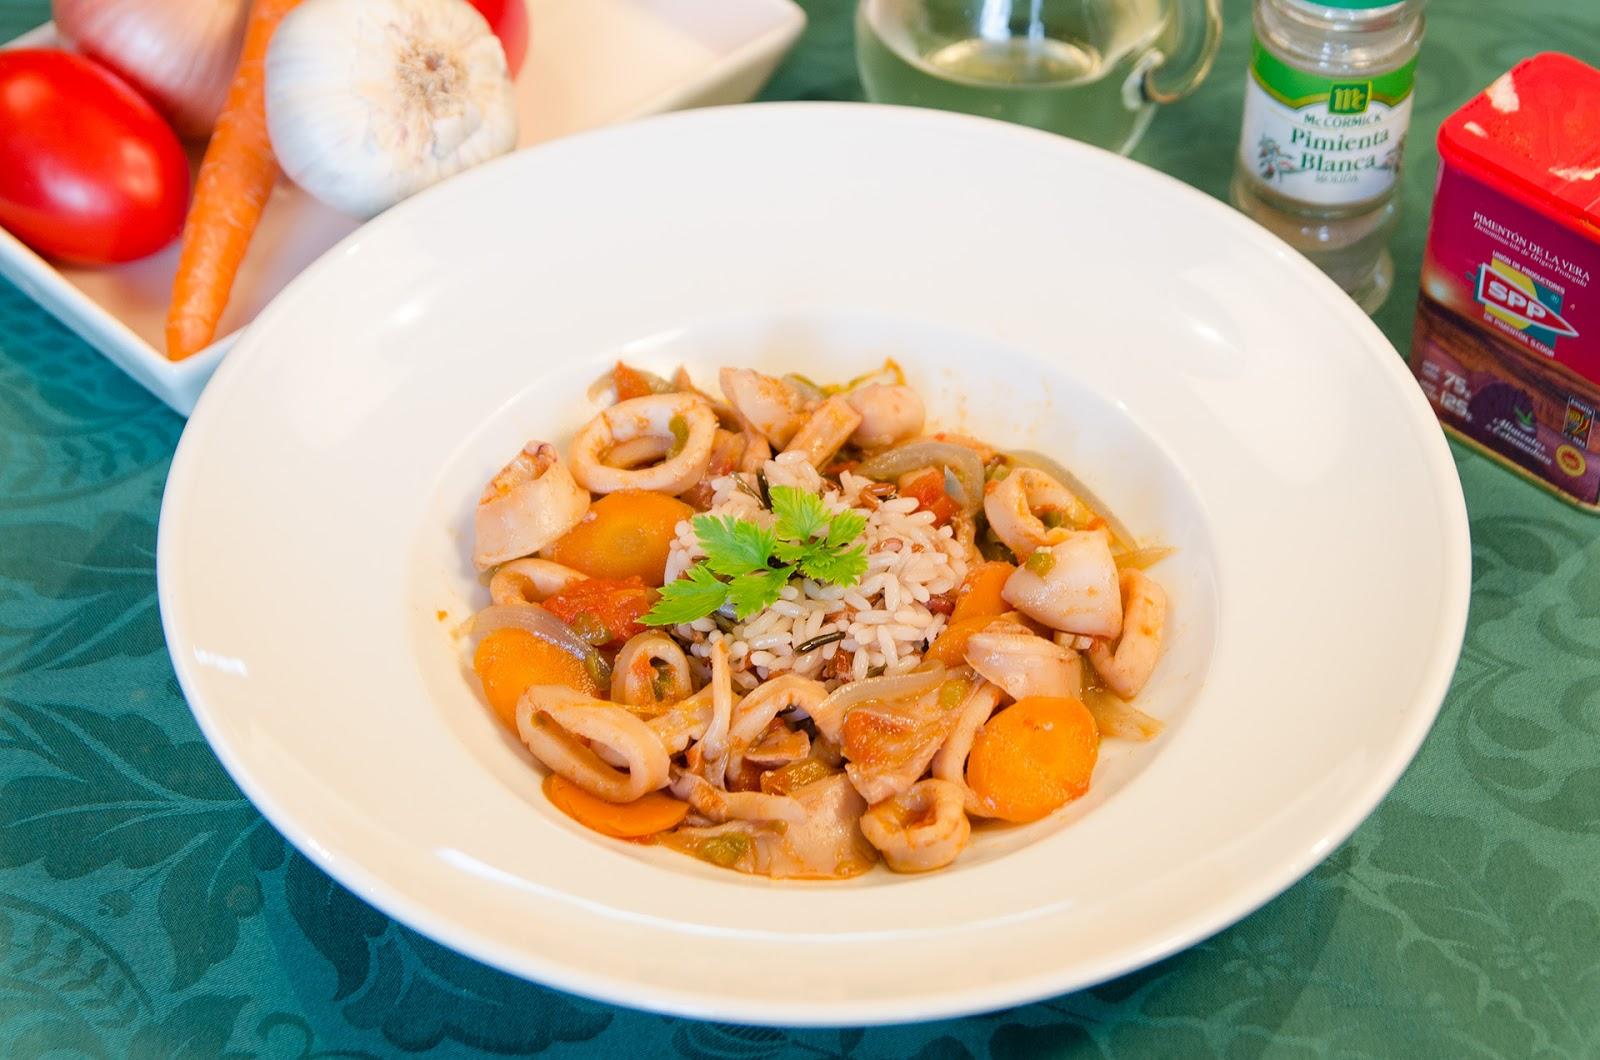 recetas-adelgazar-ligera-quema-grasas-calamares-verduras-cocina-dieta-sana-saludable-bruja